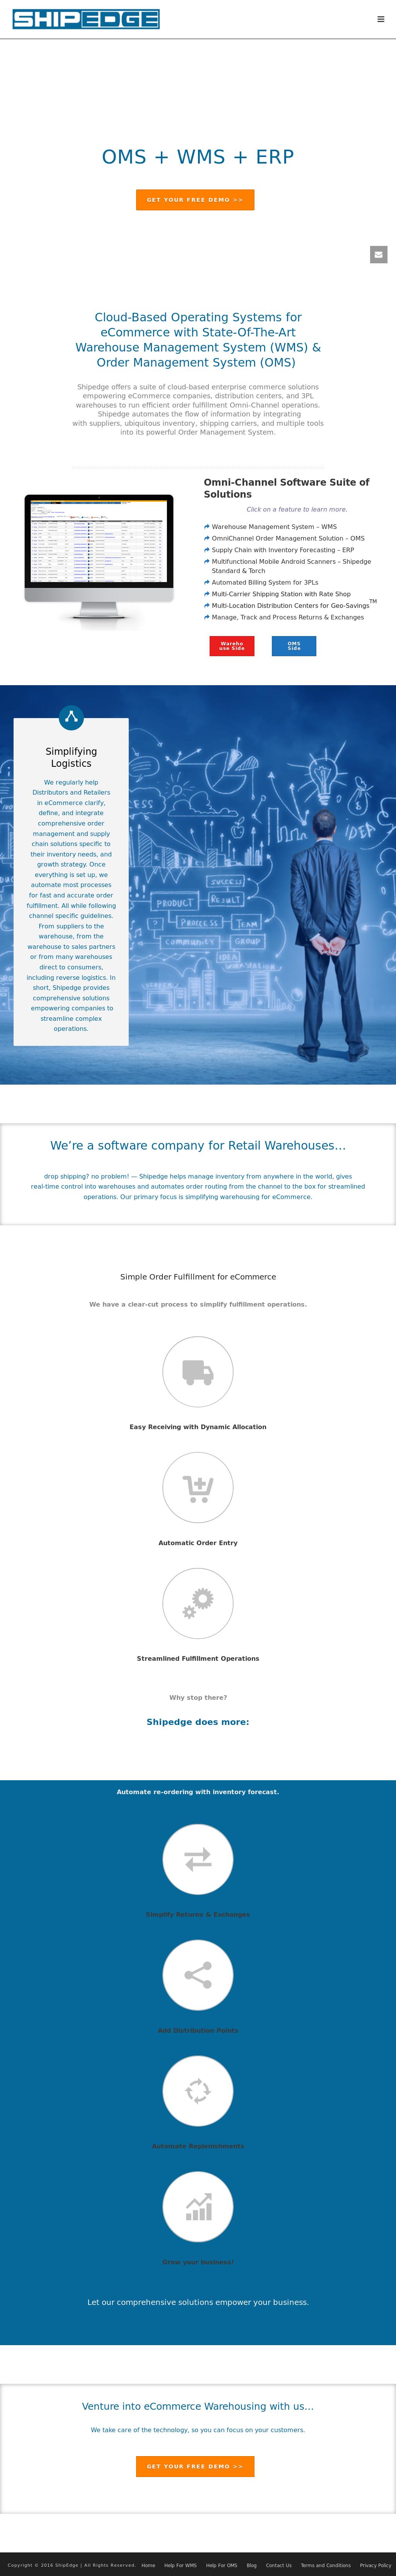 Ship Edge Competitors, Revenue and Employees - Owler Company Profile